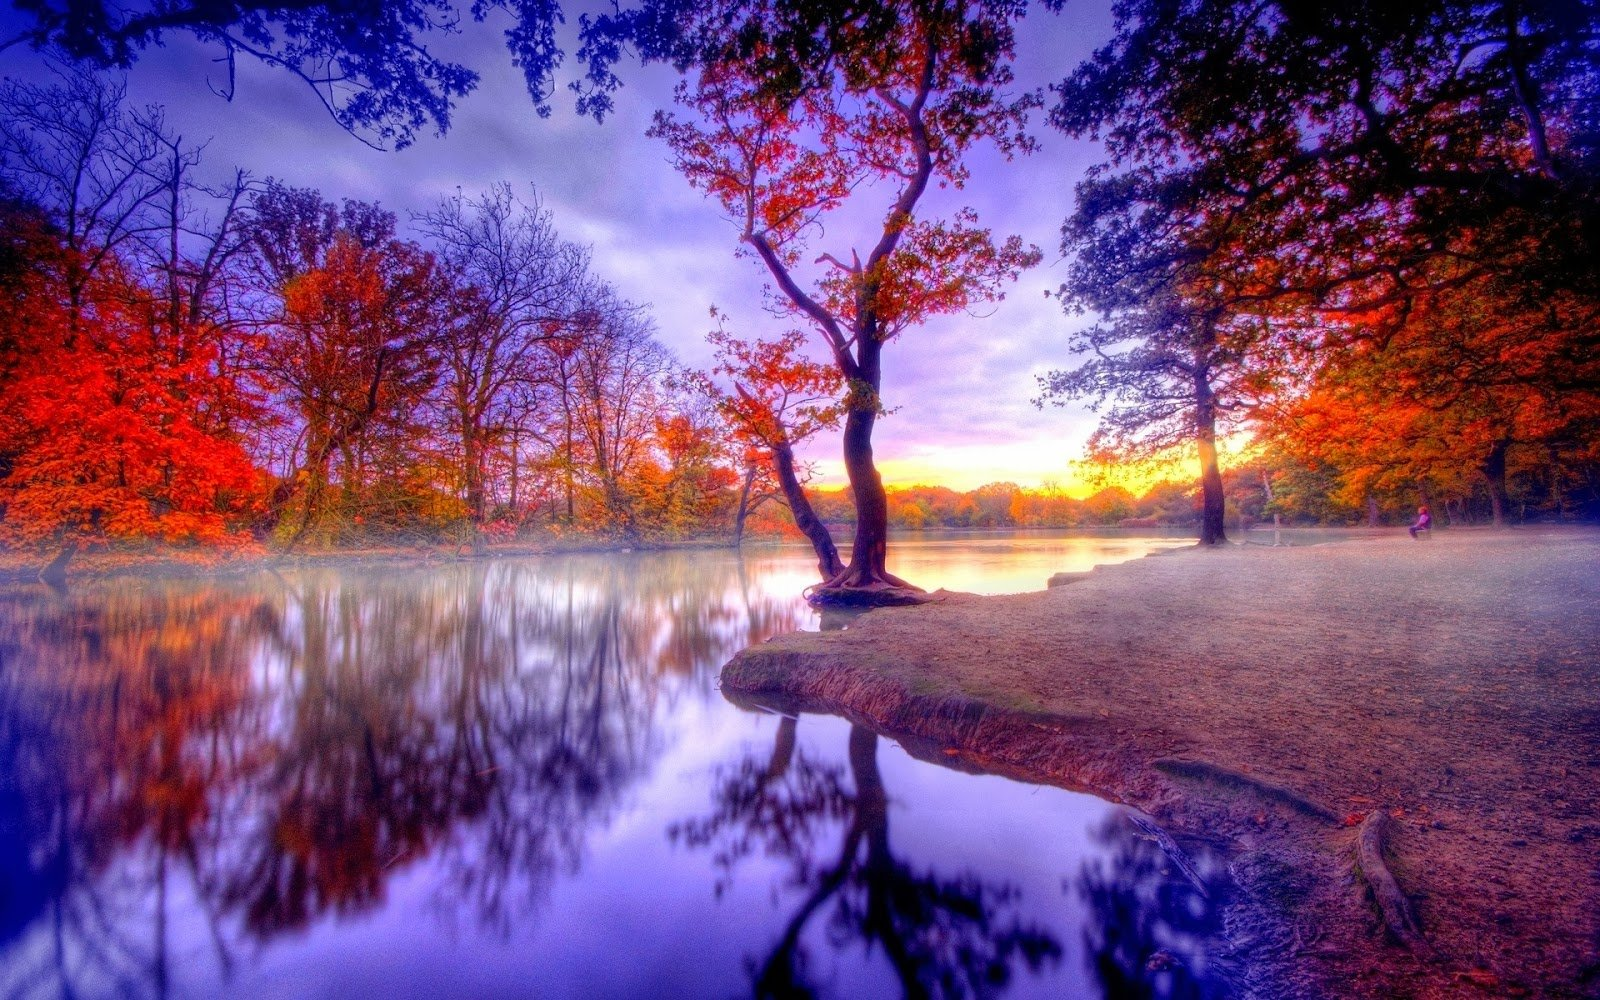 Hd wallpaper download nature - Place Lake Full Hd Size Nature Wallpapers Free Downloads Full Hd